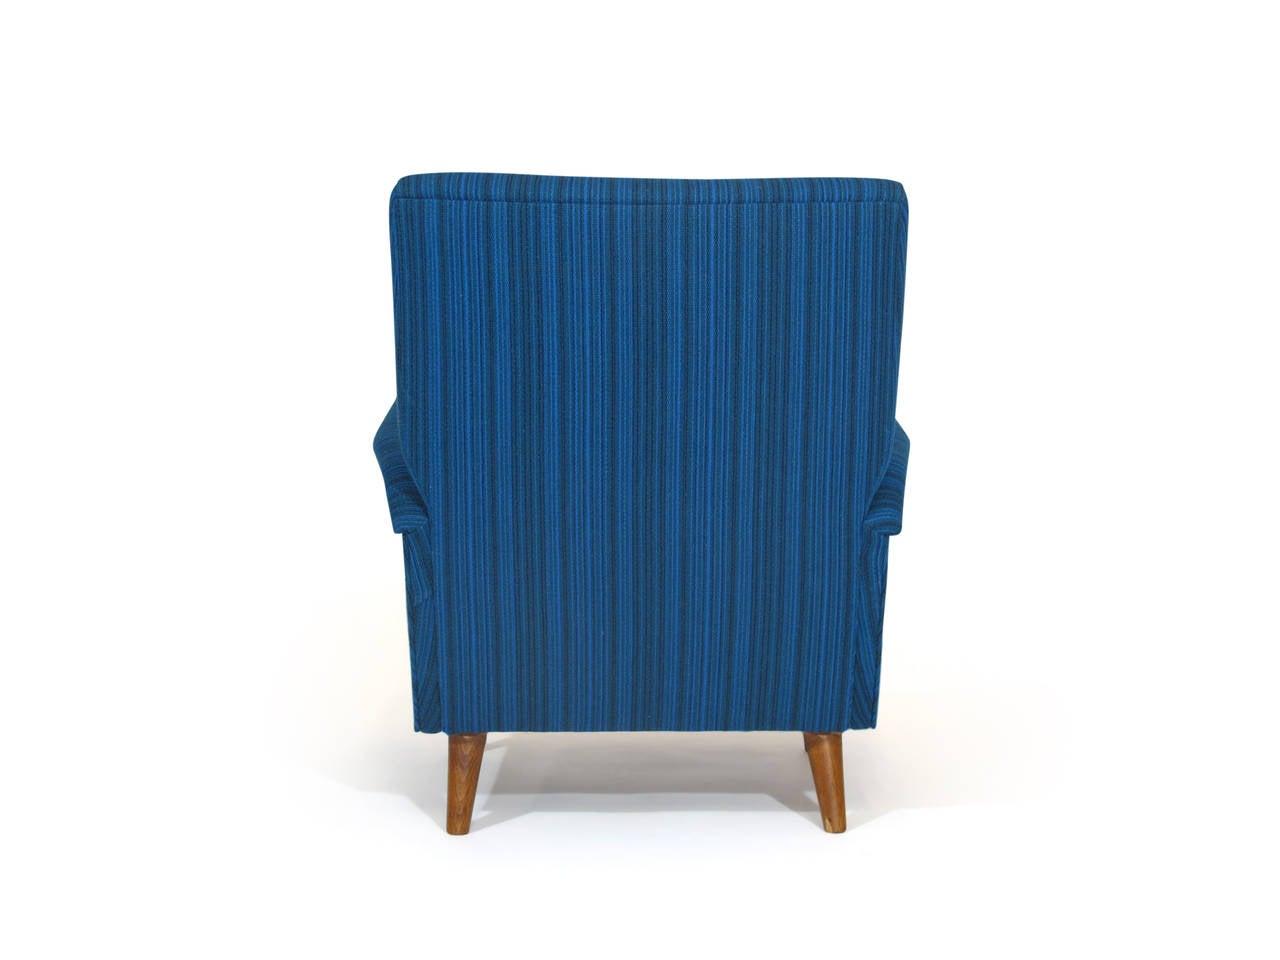 Wool Gio Ponti Model 803 Mid-Century Italian Lounge Chair For Sale